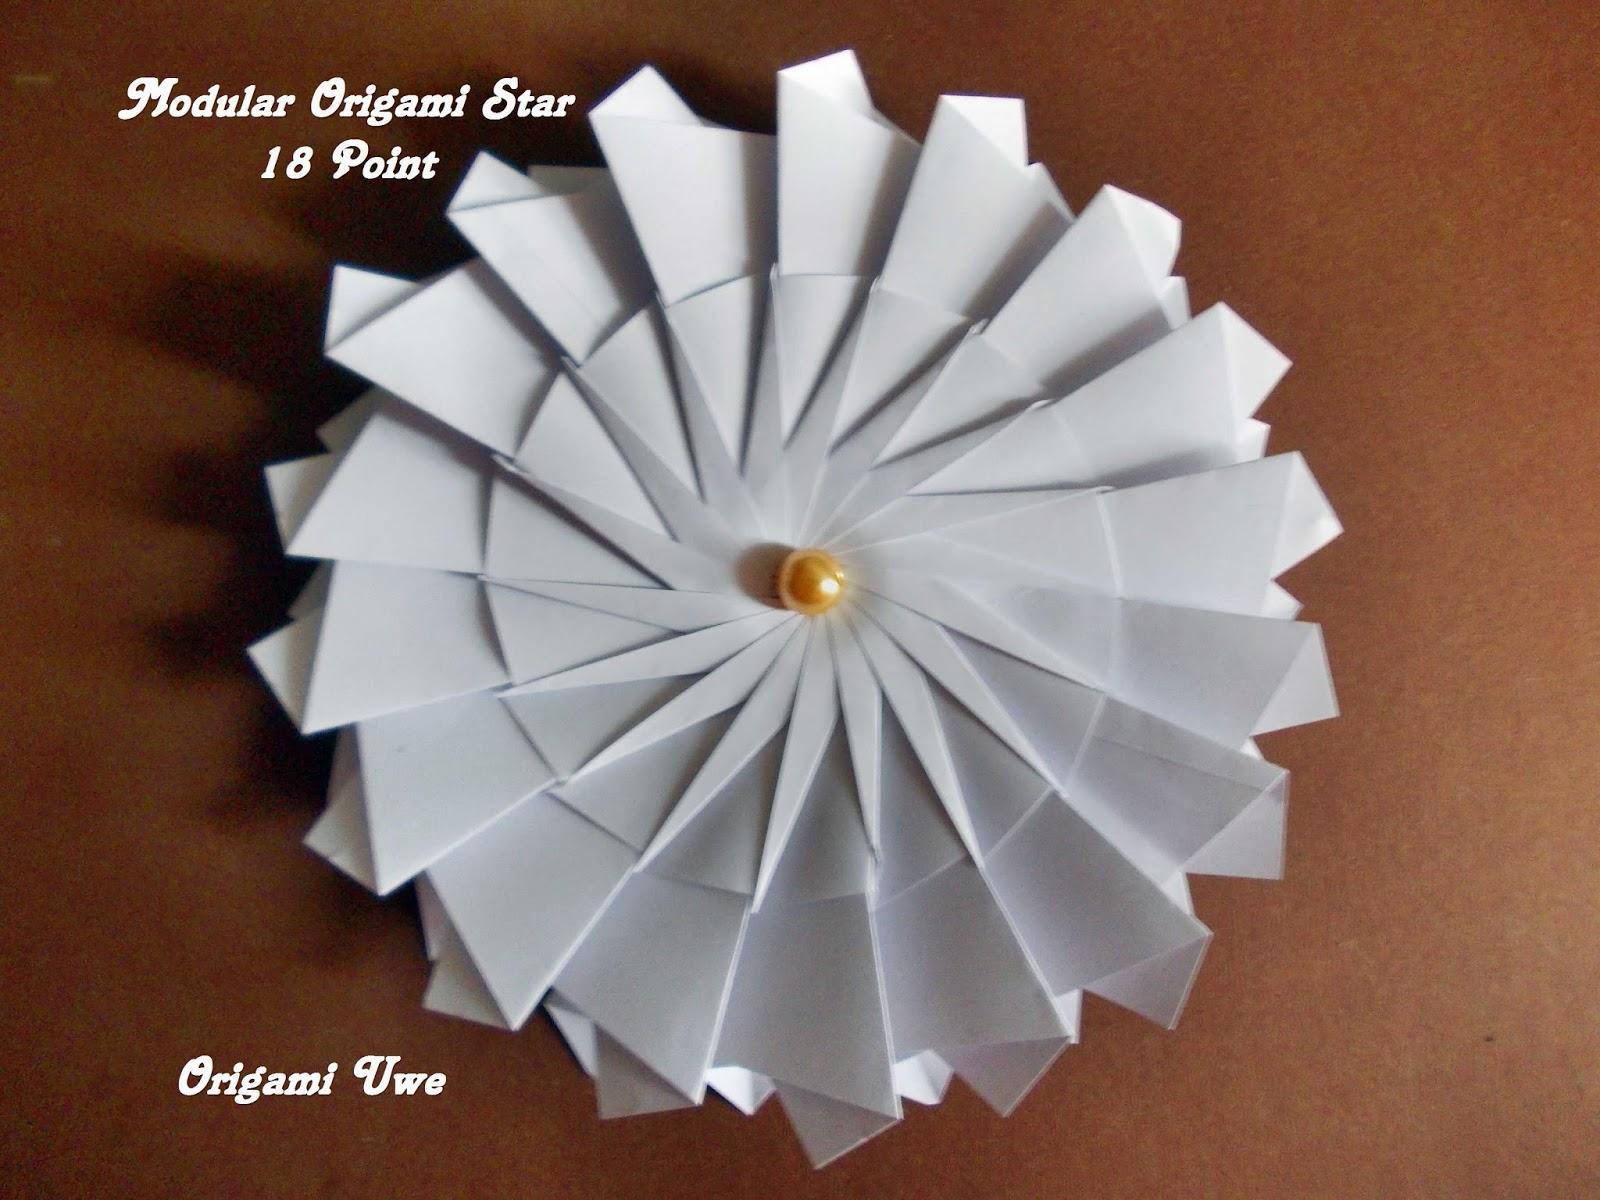 Origami, Fleurogami und Sterne: Modular Origami Star - photo#38